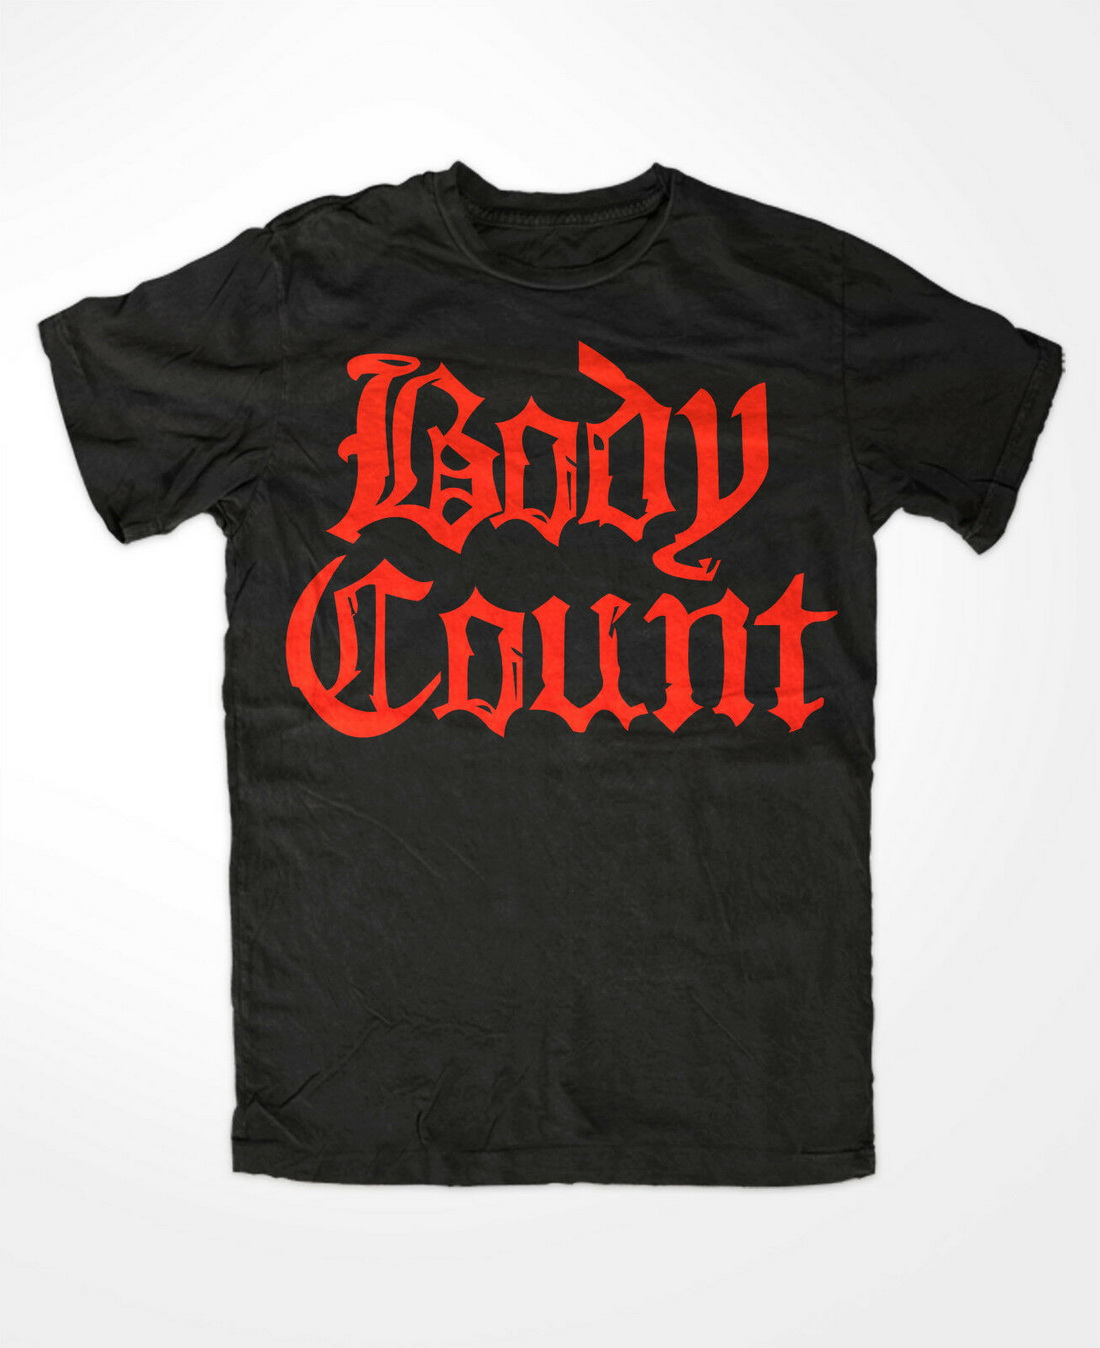 BODY COUNT-Born Dead-Rap Metal T/_shirt SIZES:S to 6XL Suicidal Tendencies